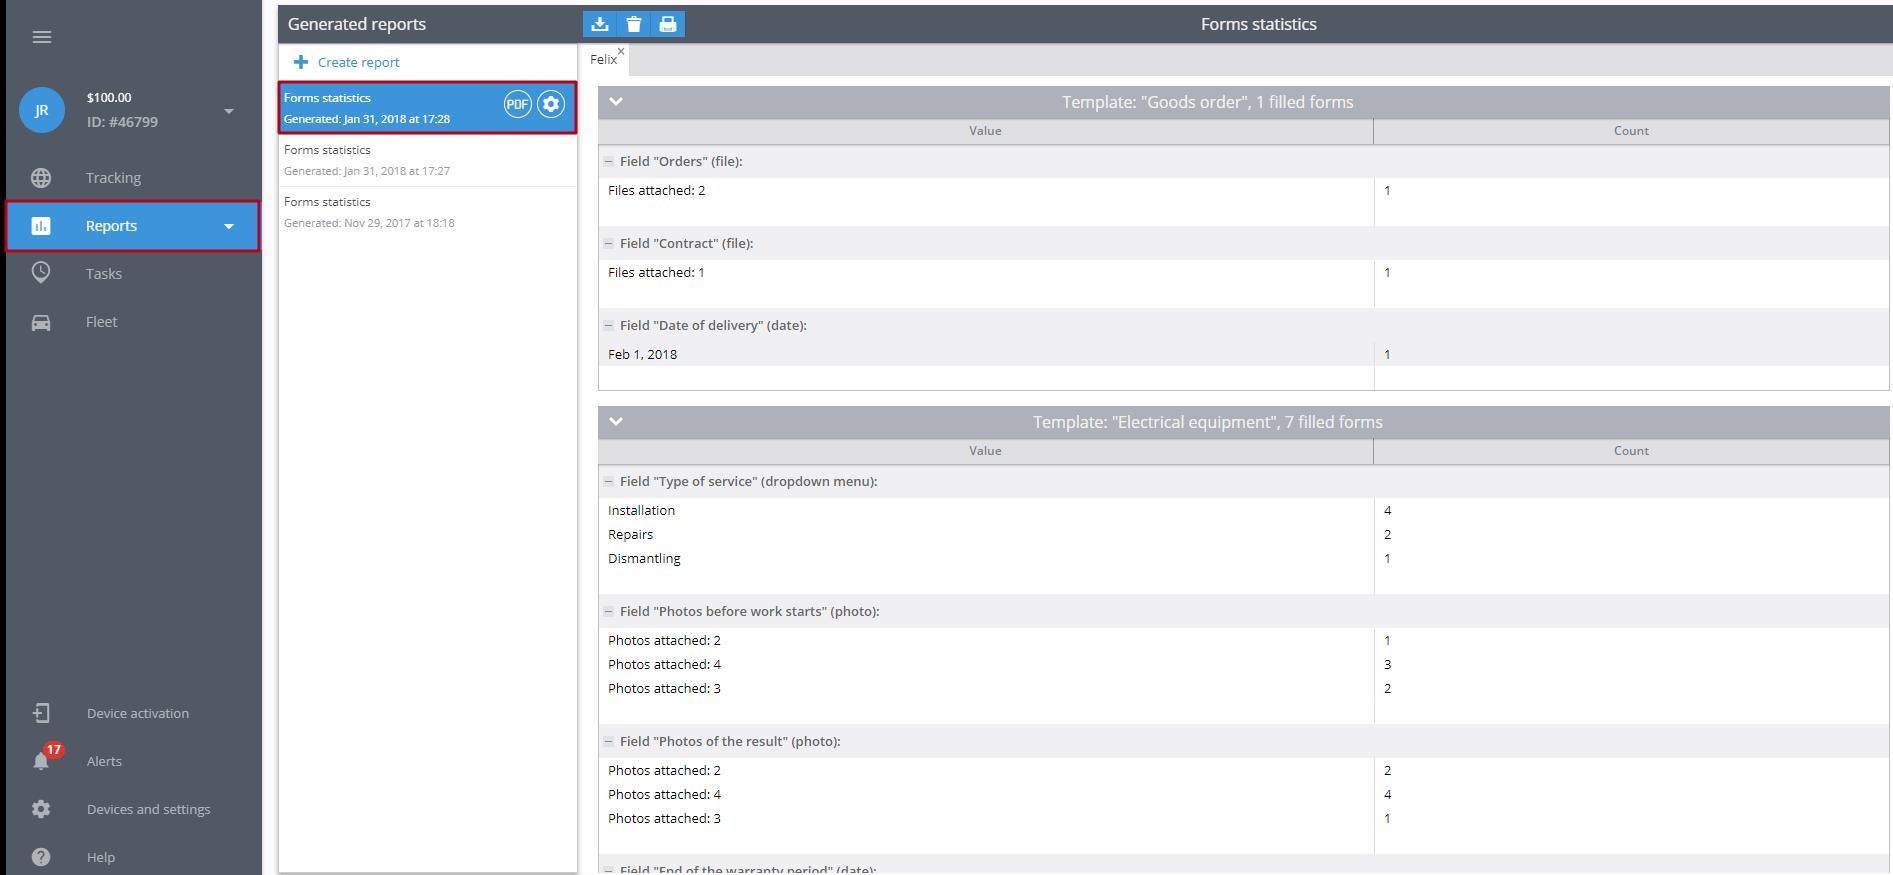 Task form values